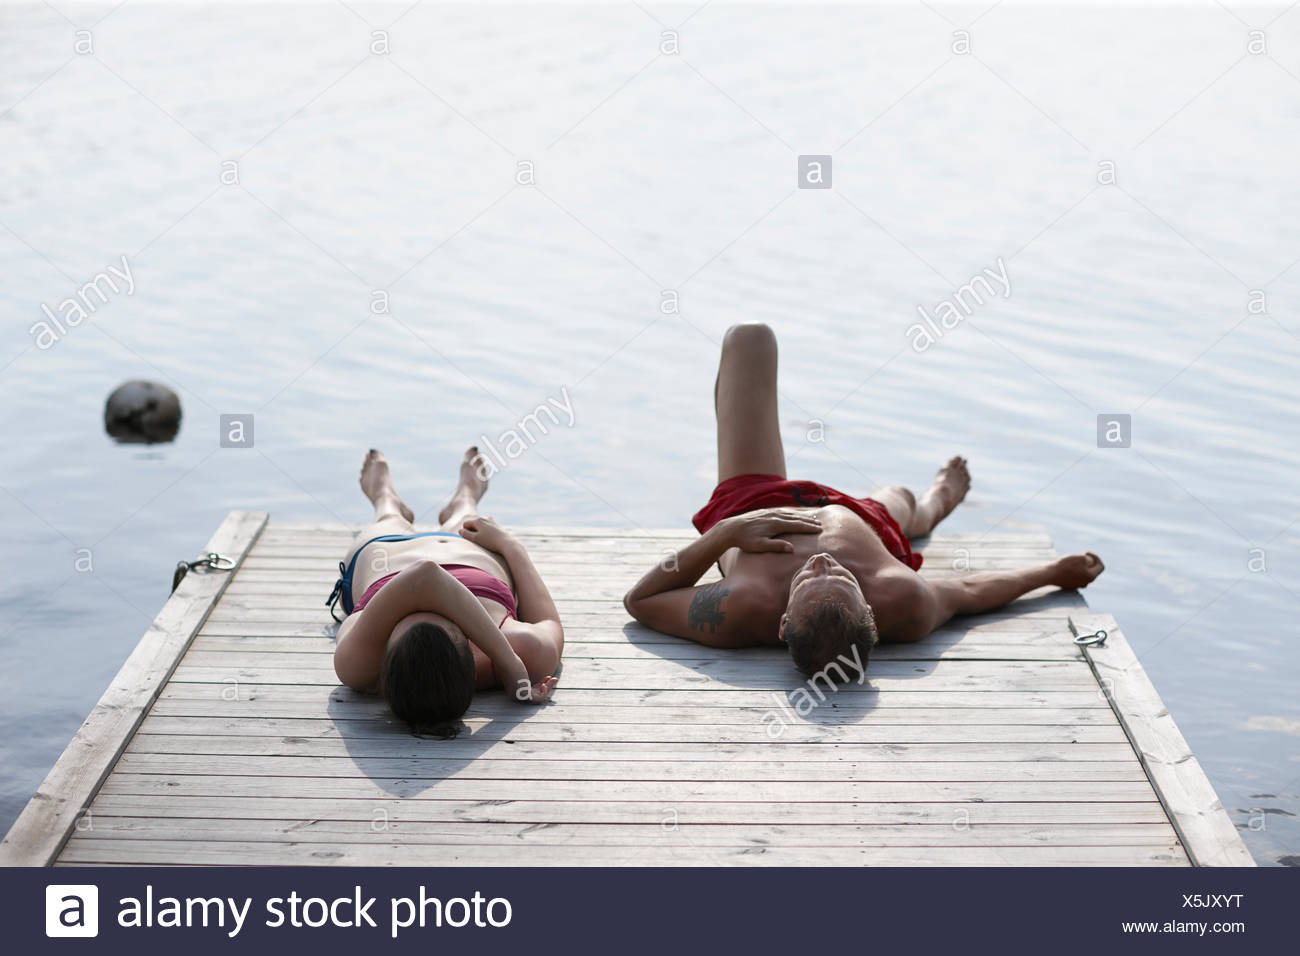 La Svezia, Dalarna, Siljan, l uomo e la donna sdraiata sul molo Foto Stock